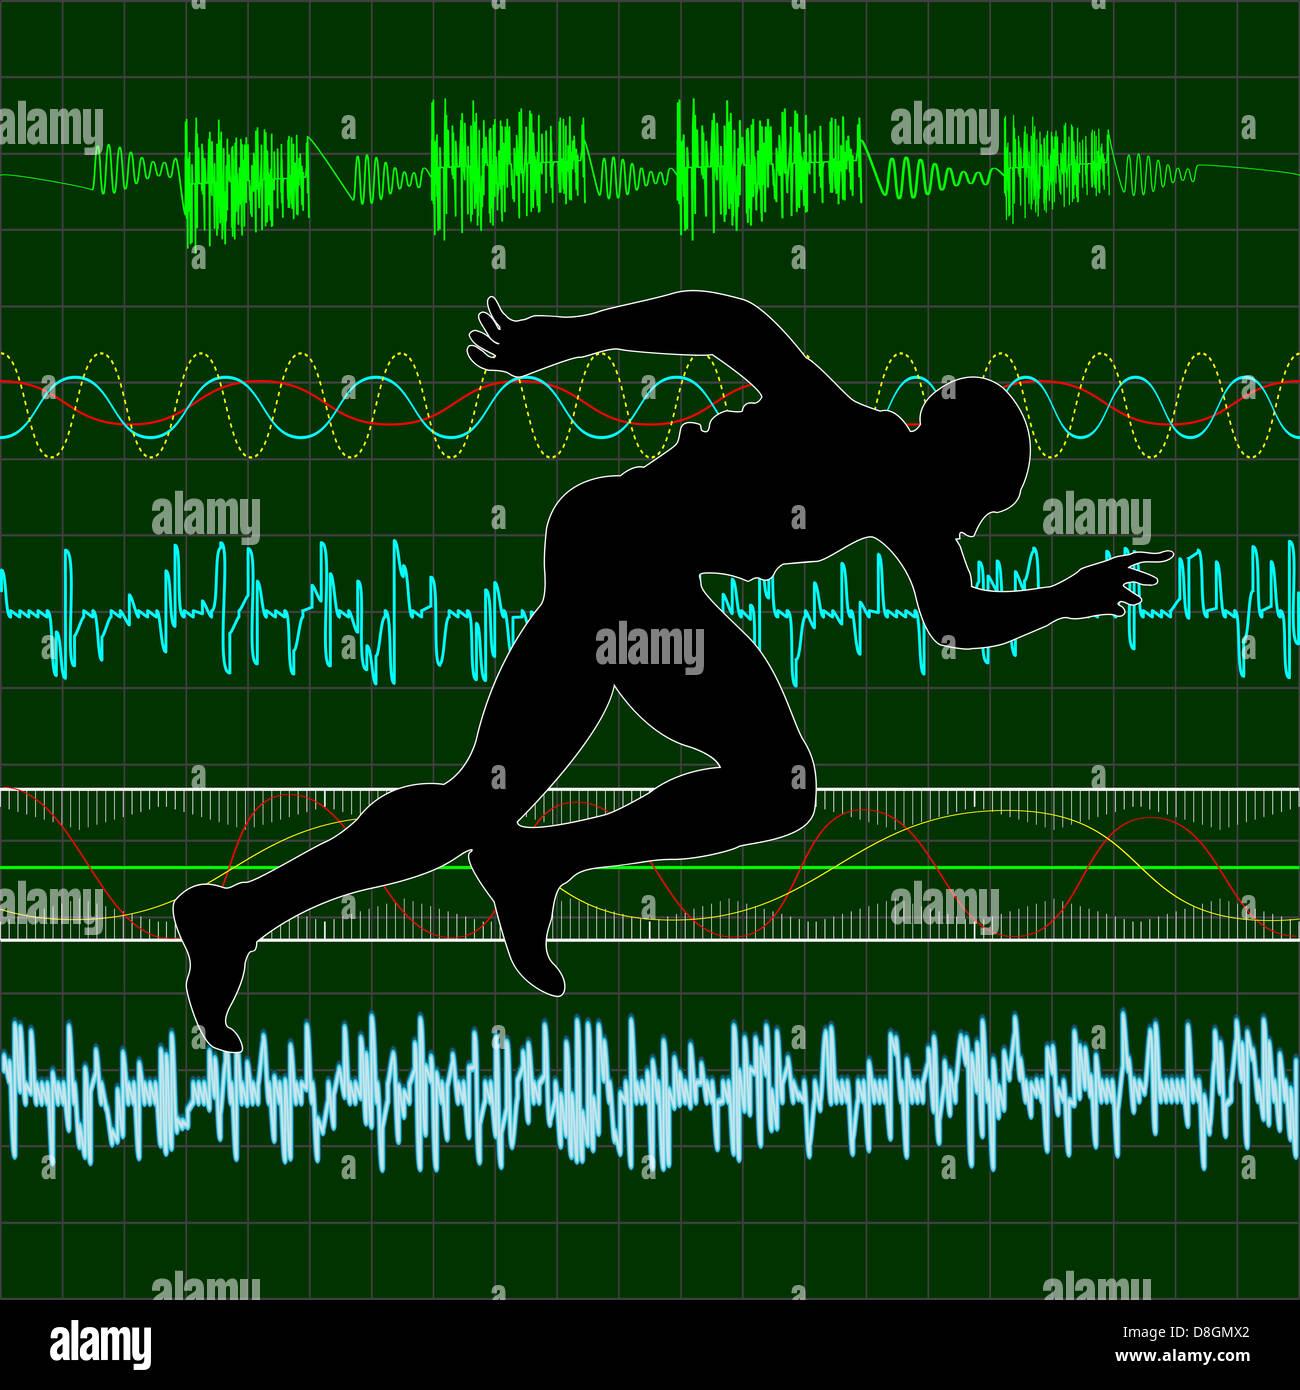 Cardio - Stock Image